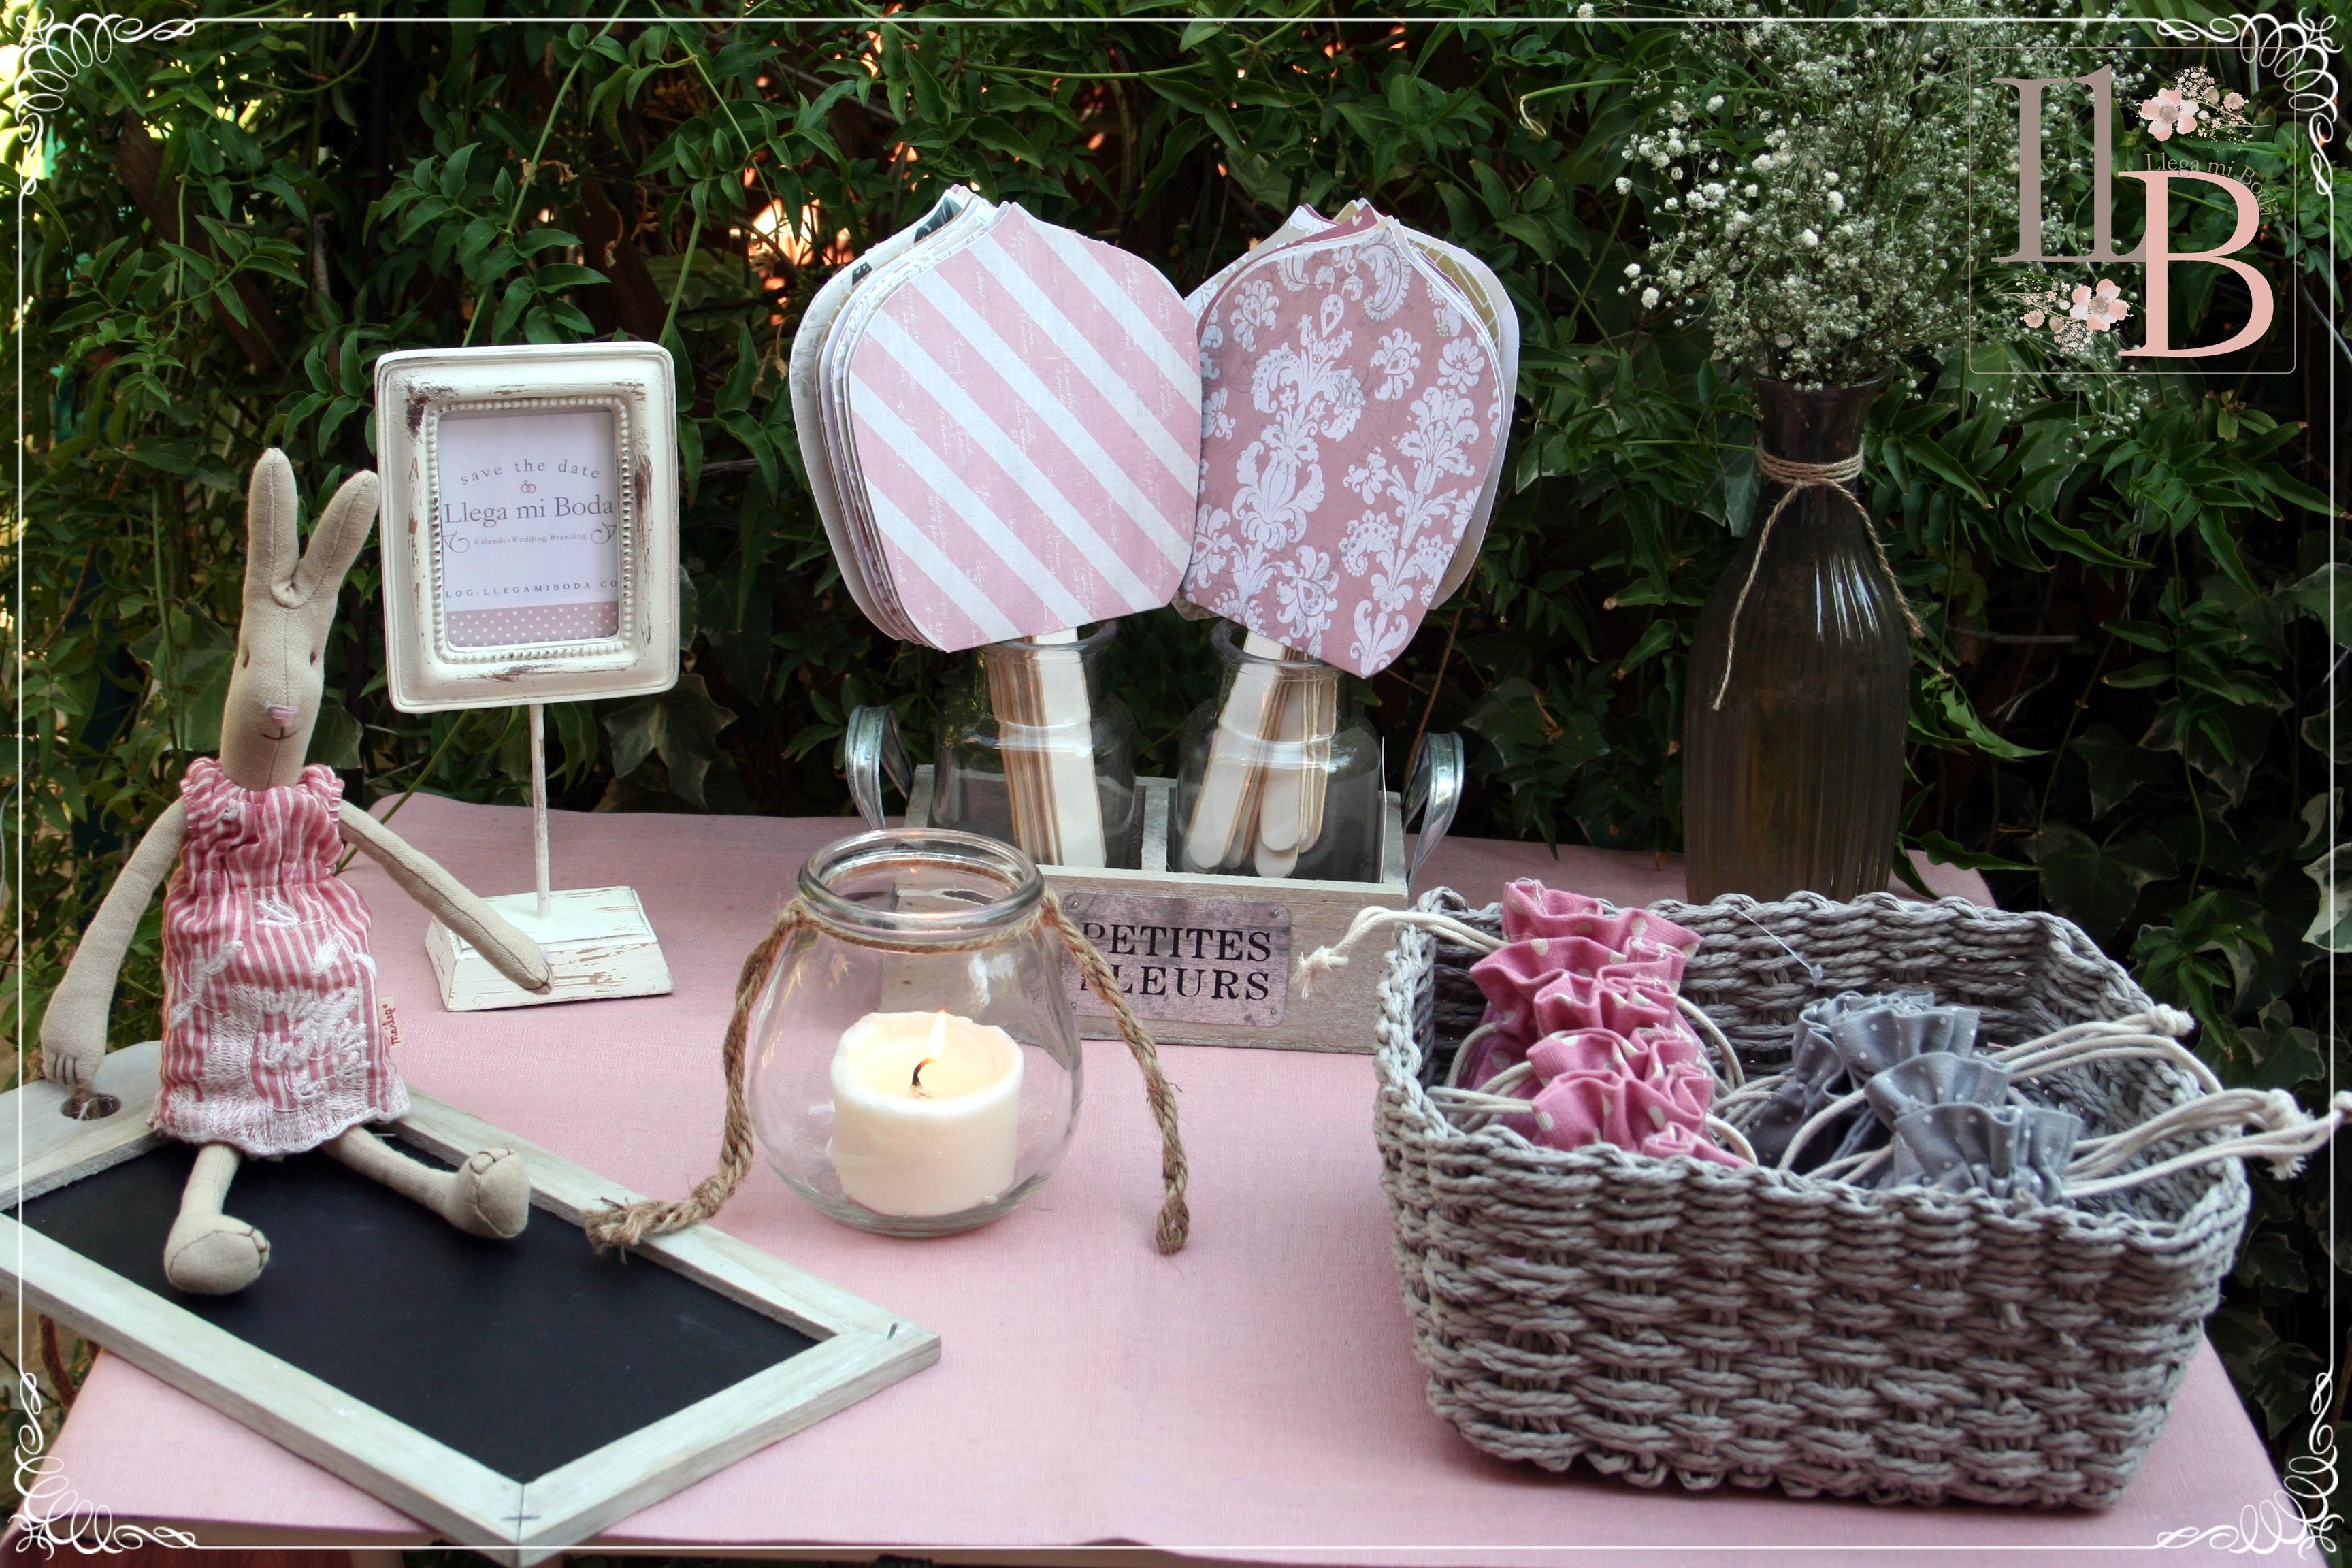 Regalos llega mi boda blog de bodas wedding planner for Detalles decoracion boda